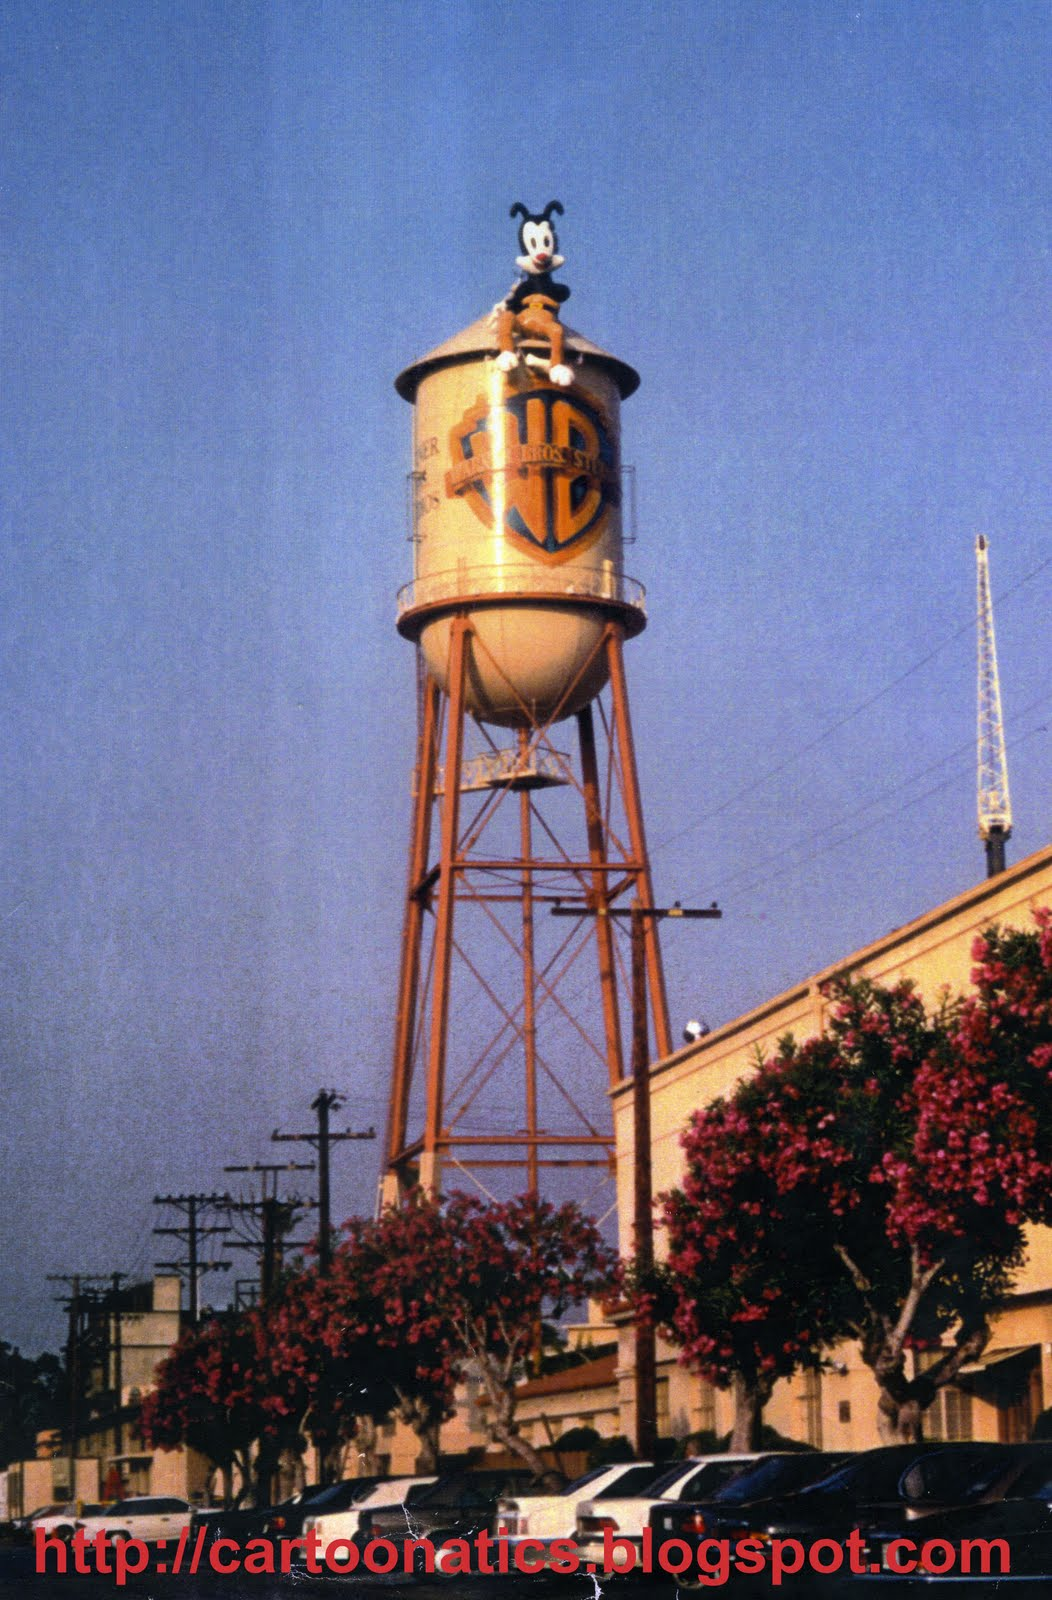 Cartoonatics: Yakko on the Warner Bros. Studio Water Tower ...